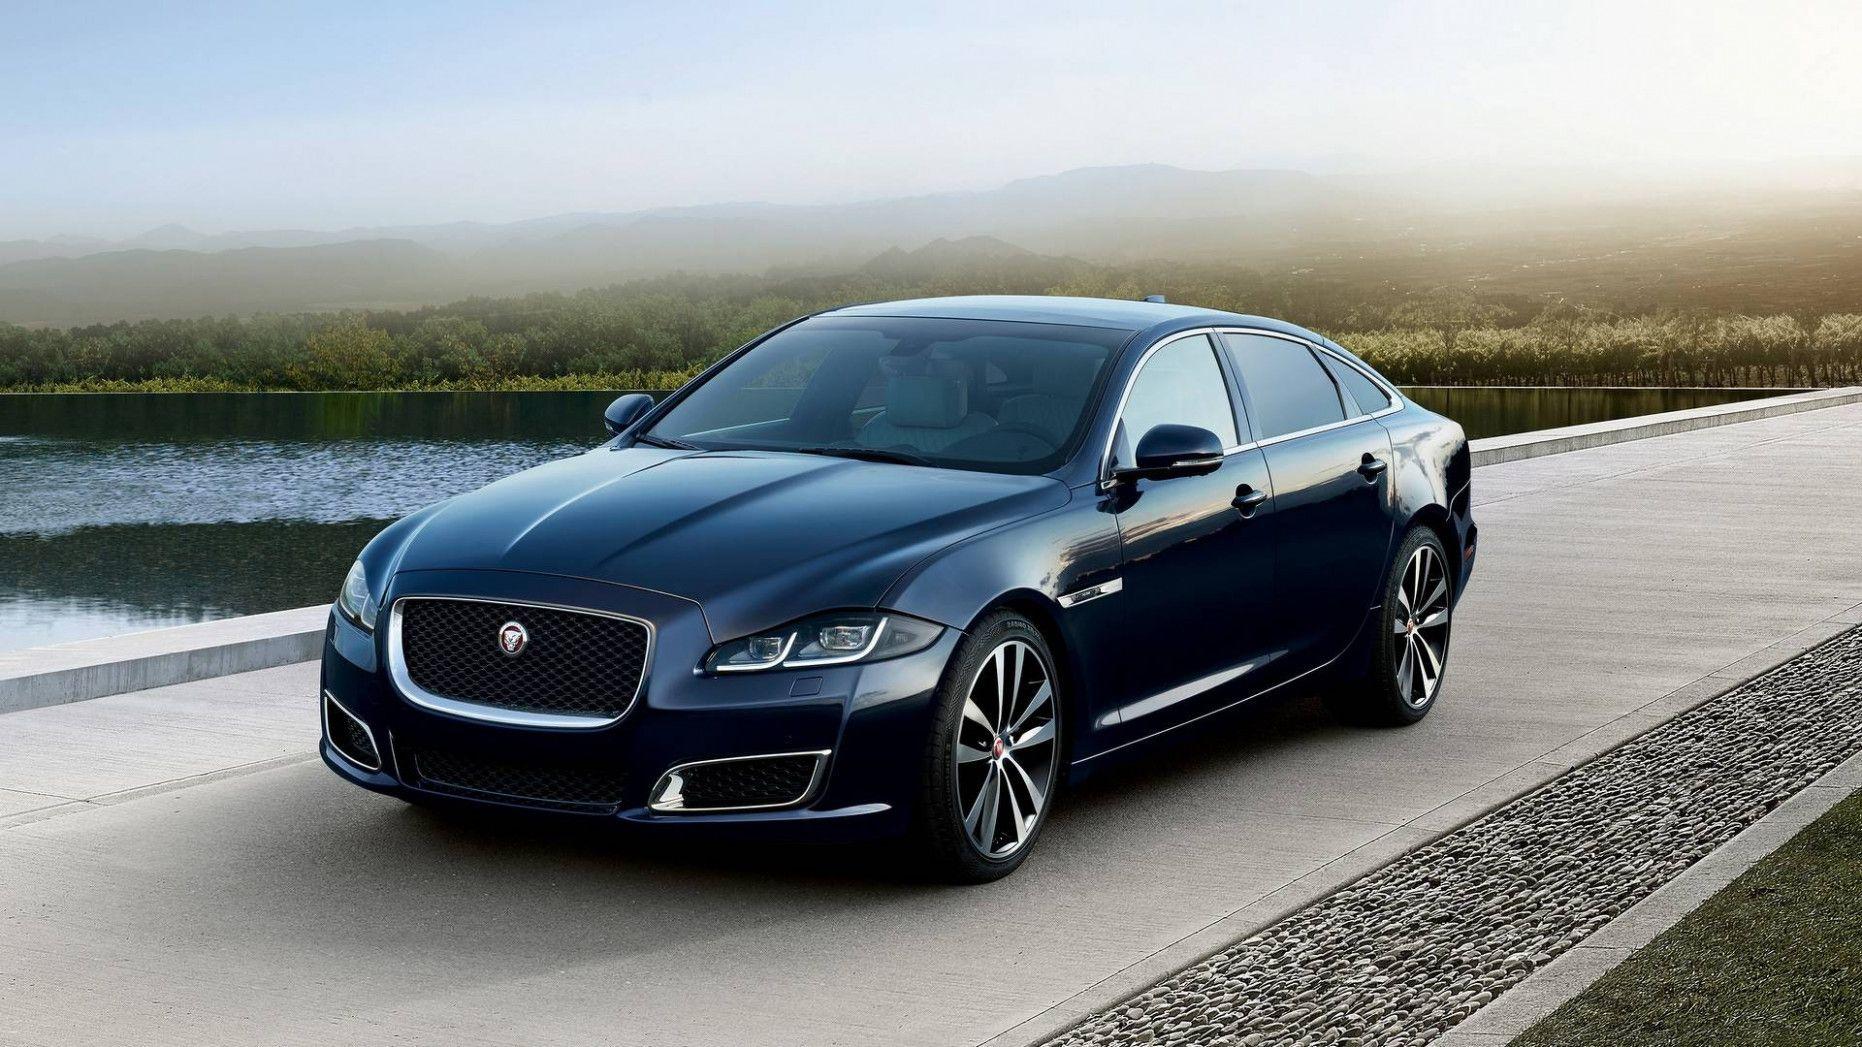 Jaguar Xj Production To End In July Ev Replacement Due 12 Jaguar New Xj 2020 In 2021 Jaguar Xj Jaguar Jaguar Xjl